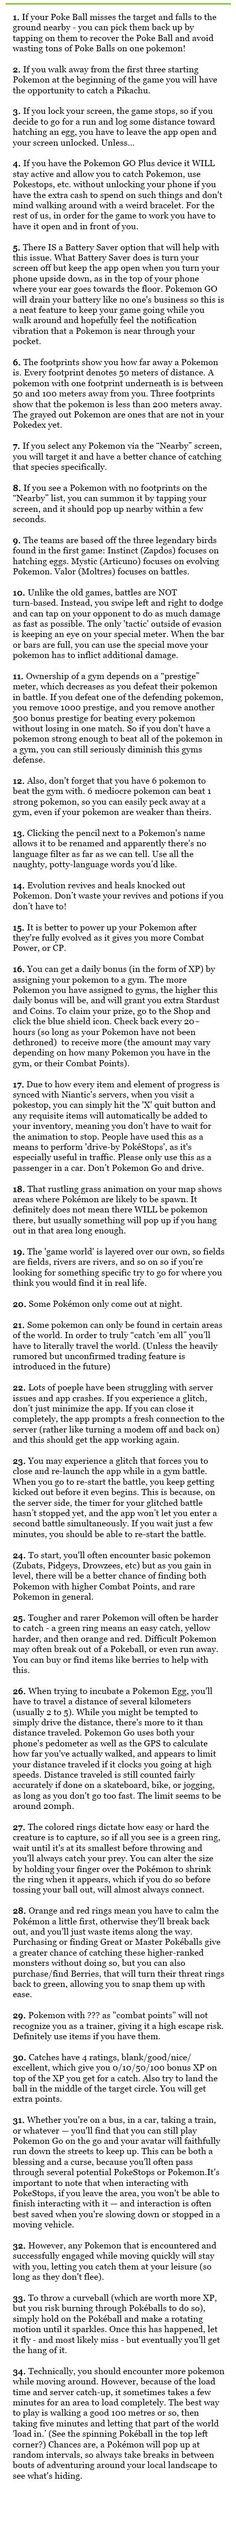 Pokemon Go - Pro Tips